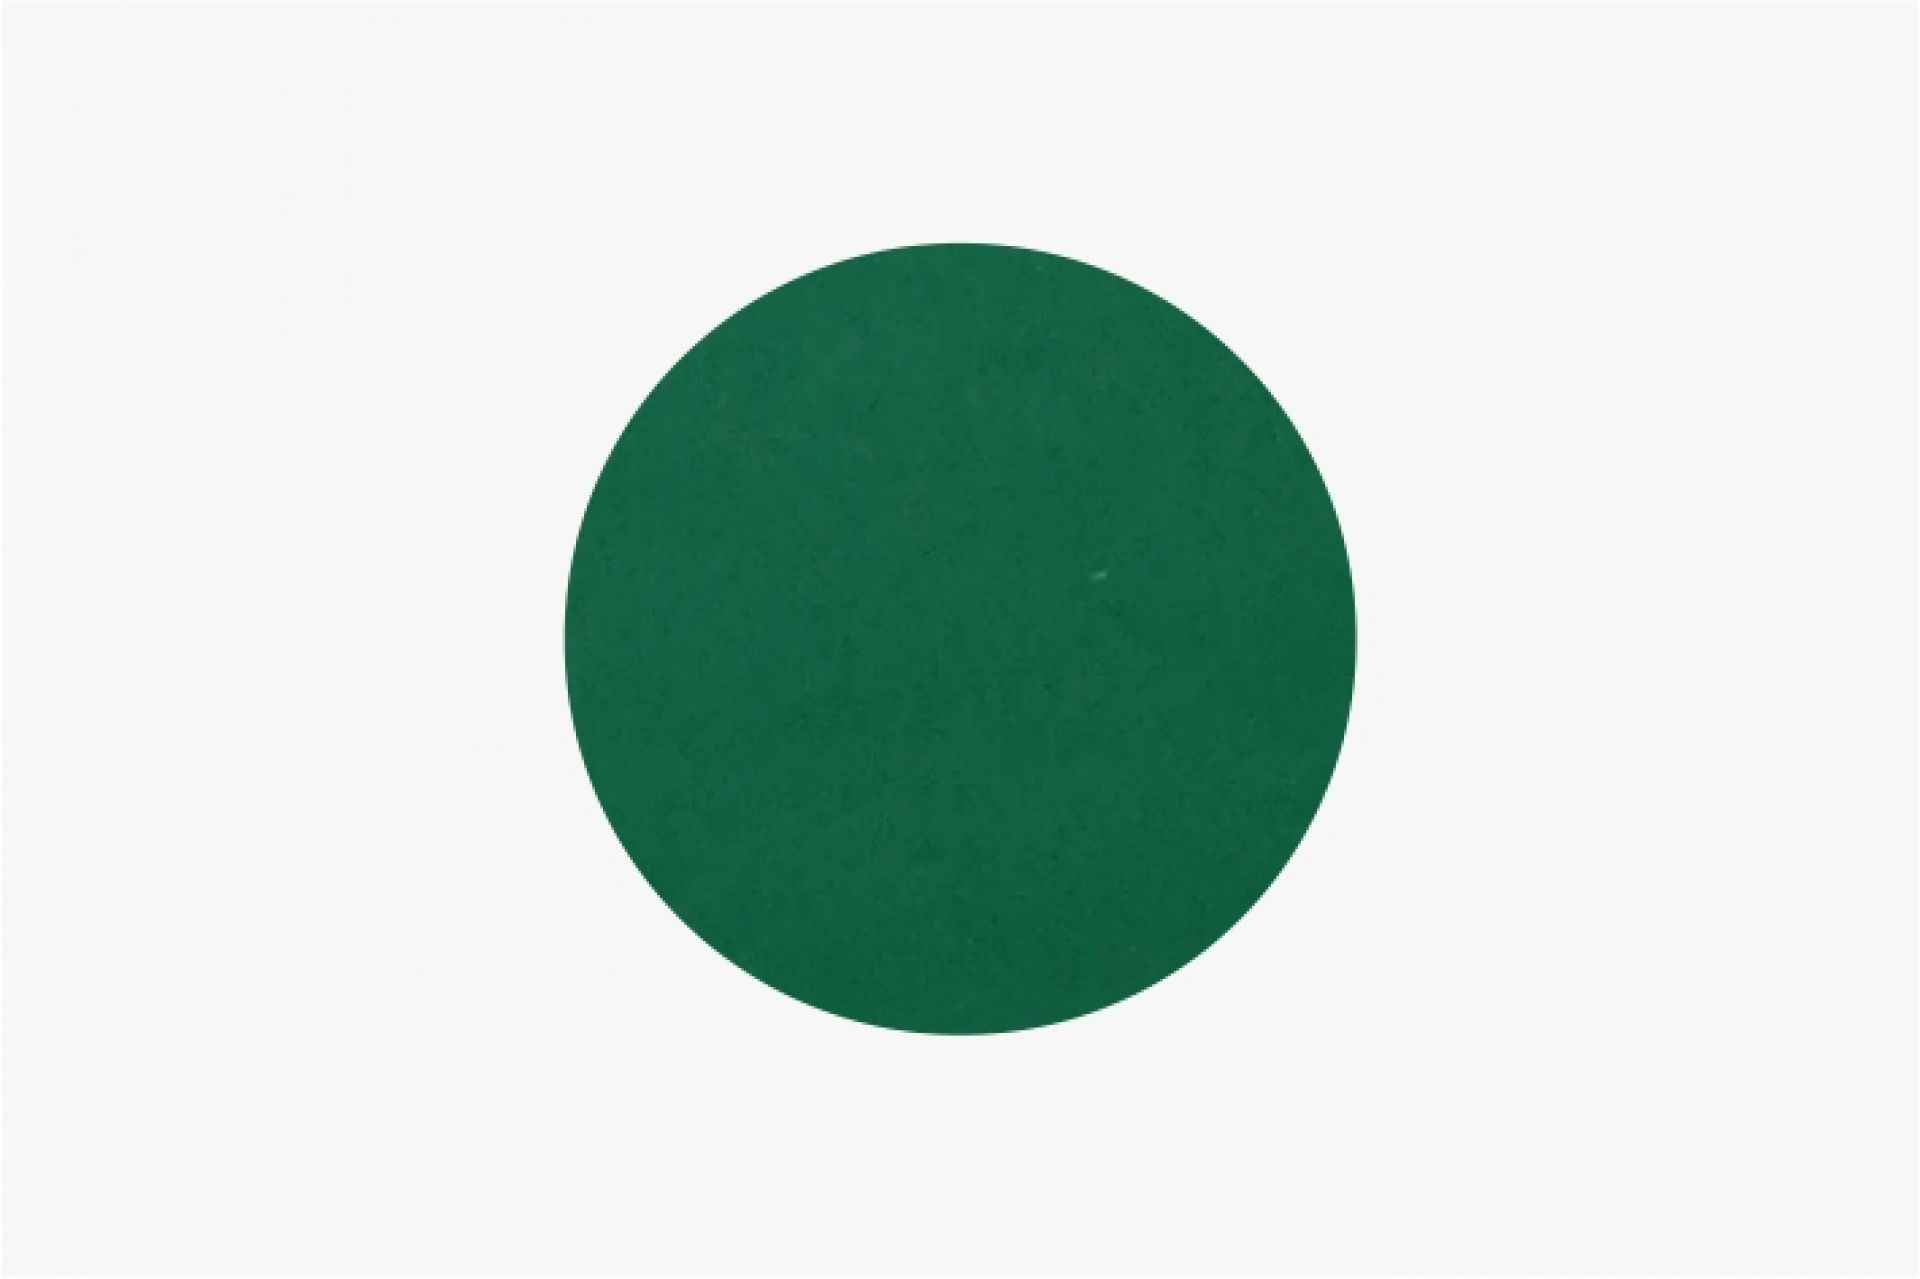 SOFT PU, SL-10 GREEN